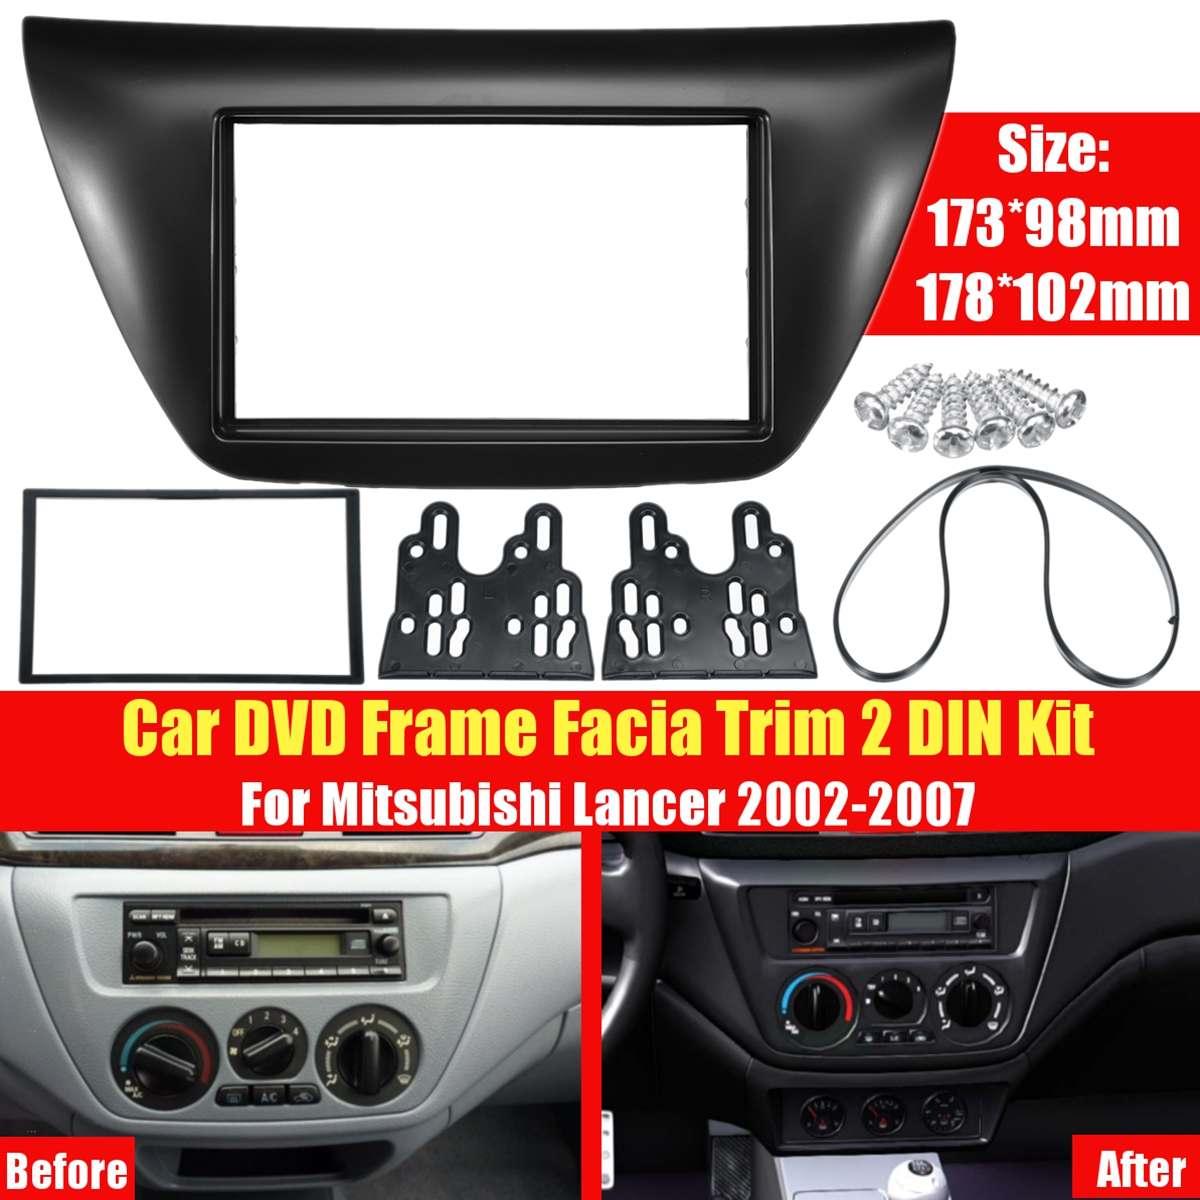 2 Din Car Radio para Panel de salpicadero CD DVD instalar Frame Dash interiores para Mitsubishi Lancer 2002-2007*173*98mm 178*102mm